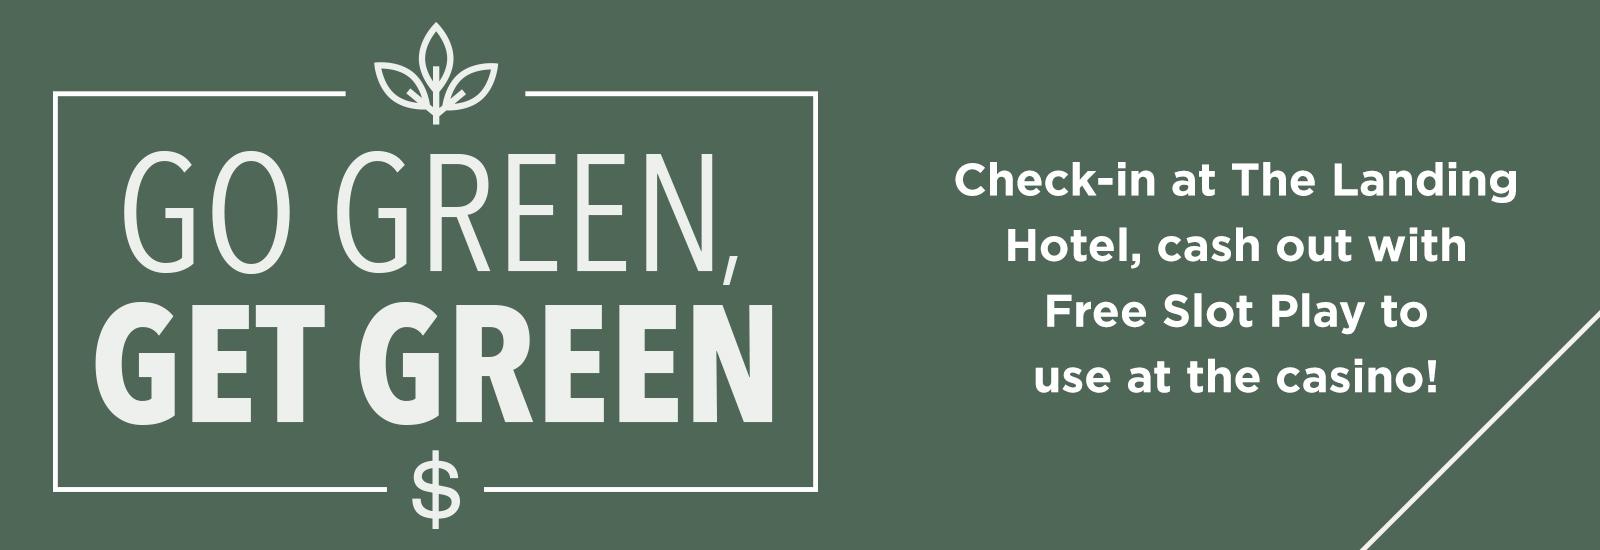 The Landing Hotel Go Green Get Green